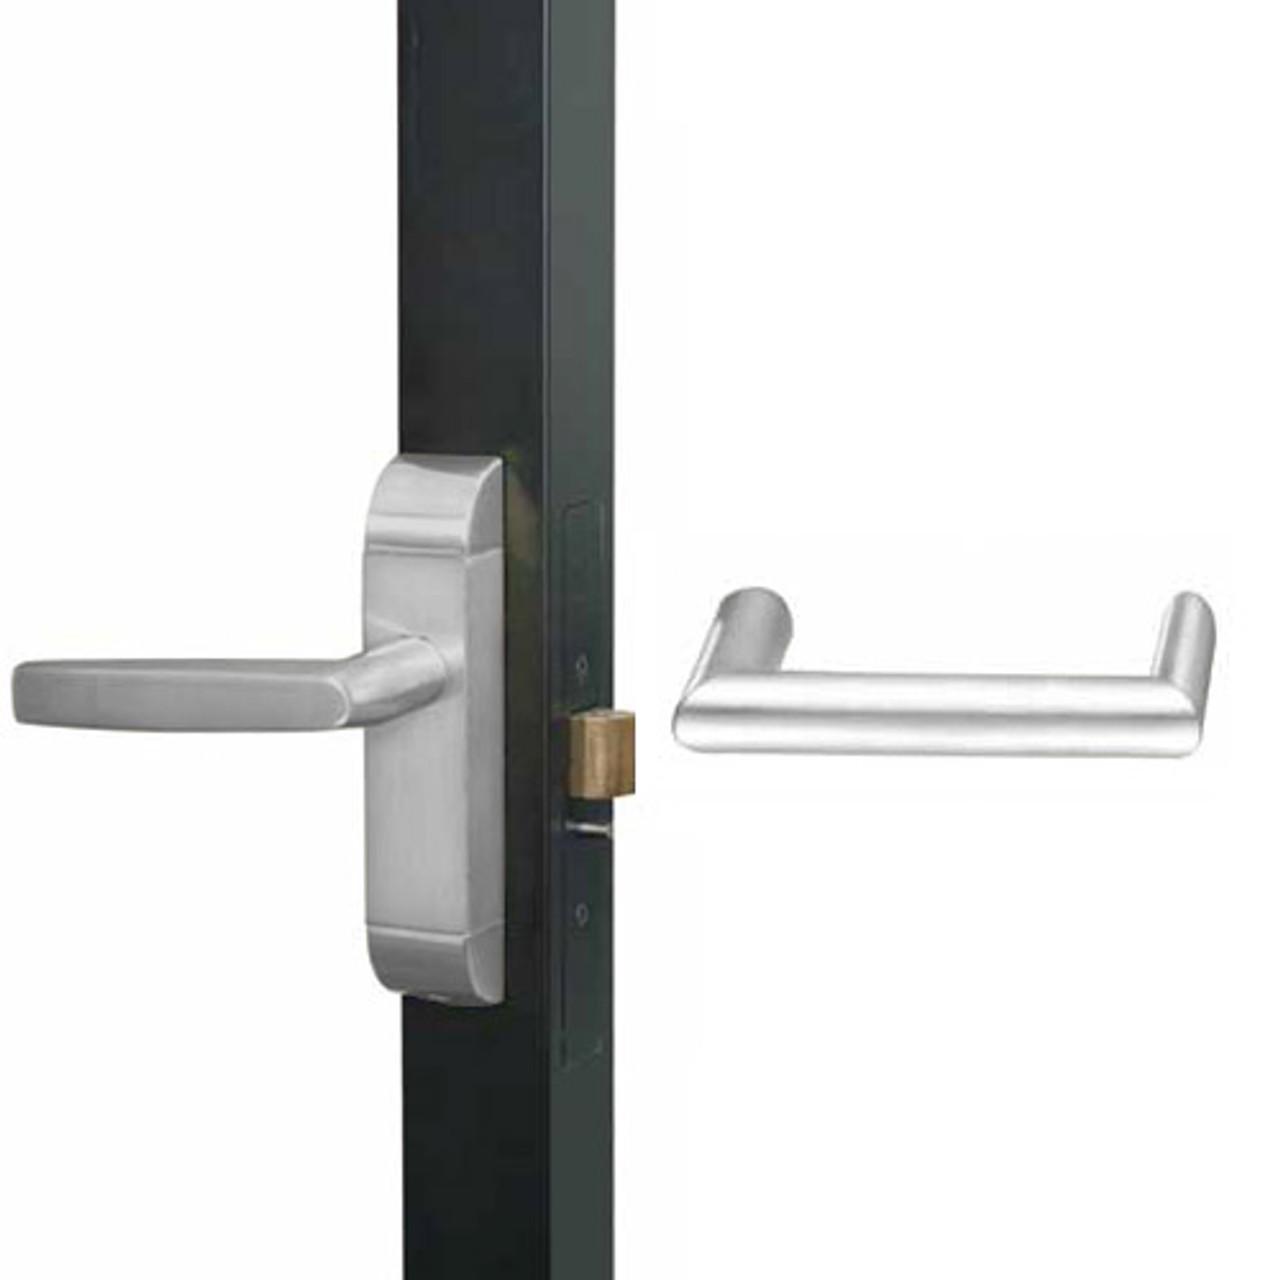 4600-MW-511-US32 Adams Rite MW Designer Deadlatch handle in Bright Stainless Finish